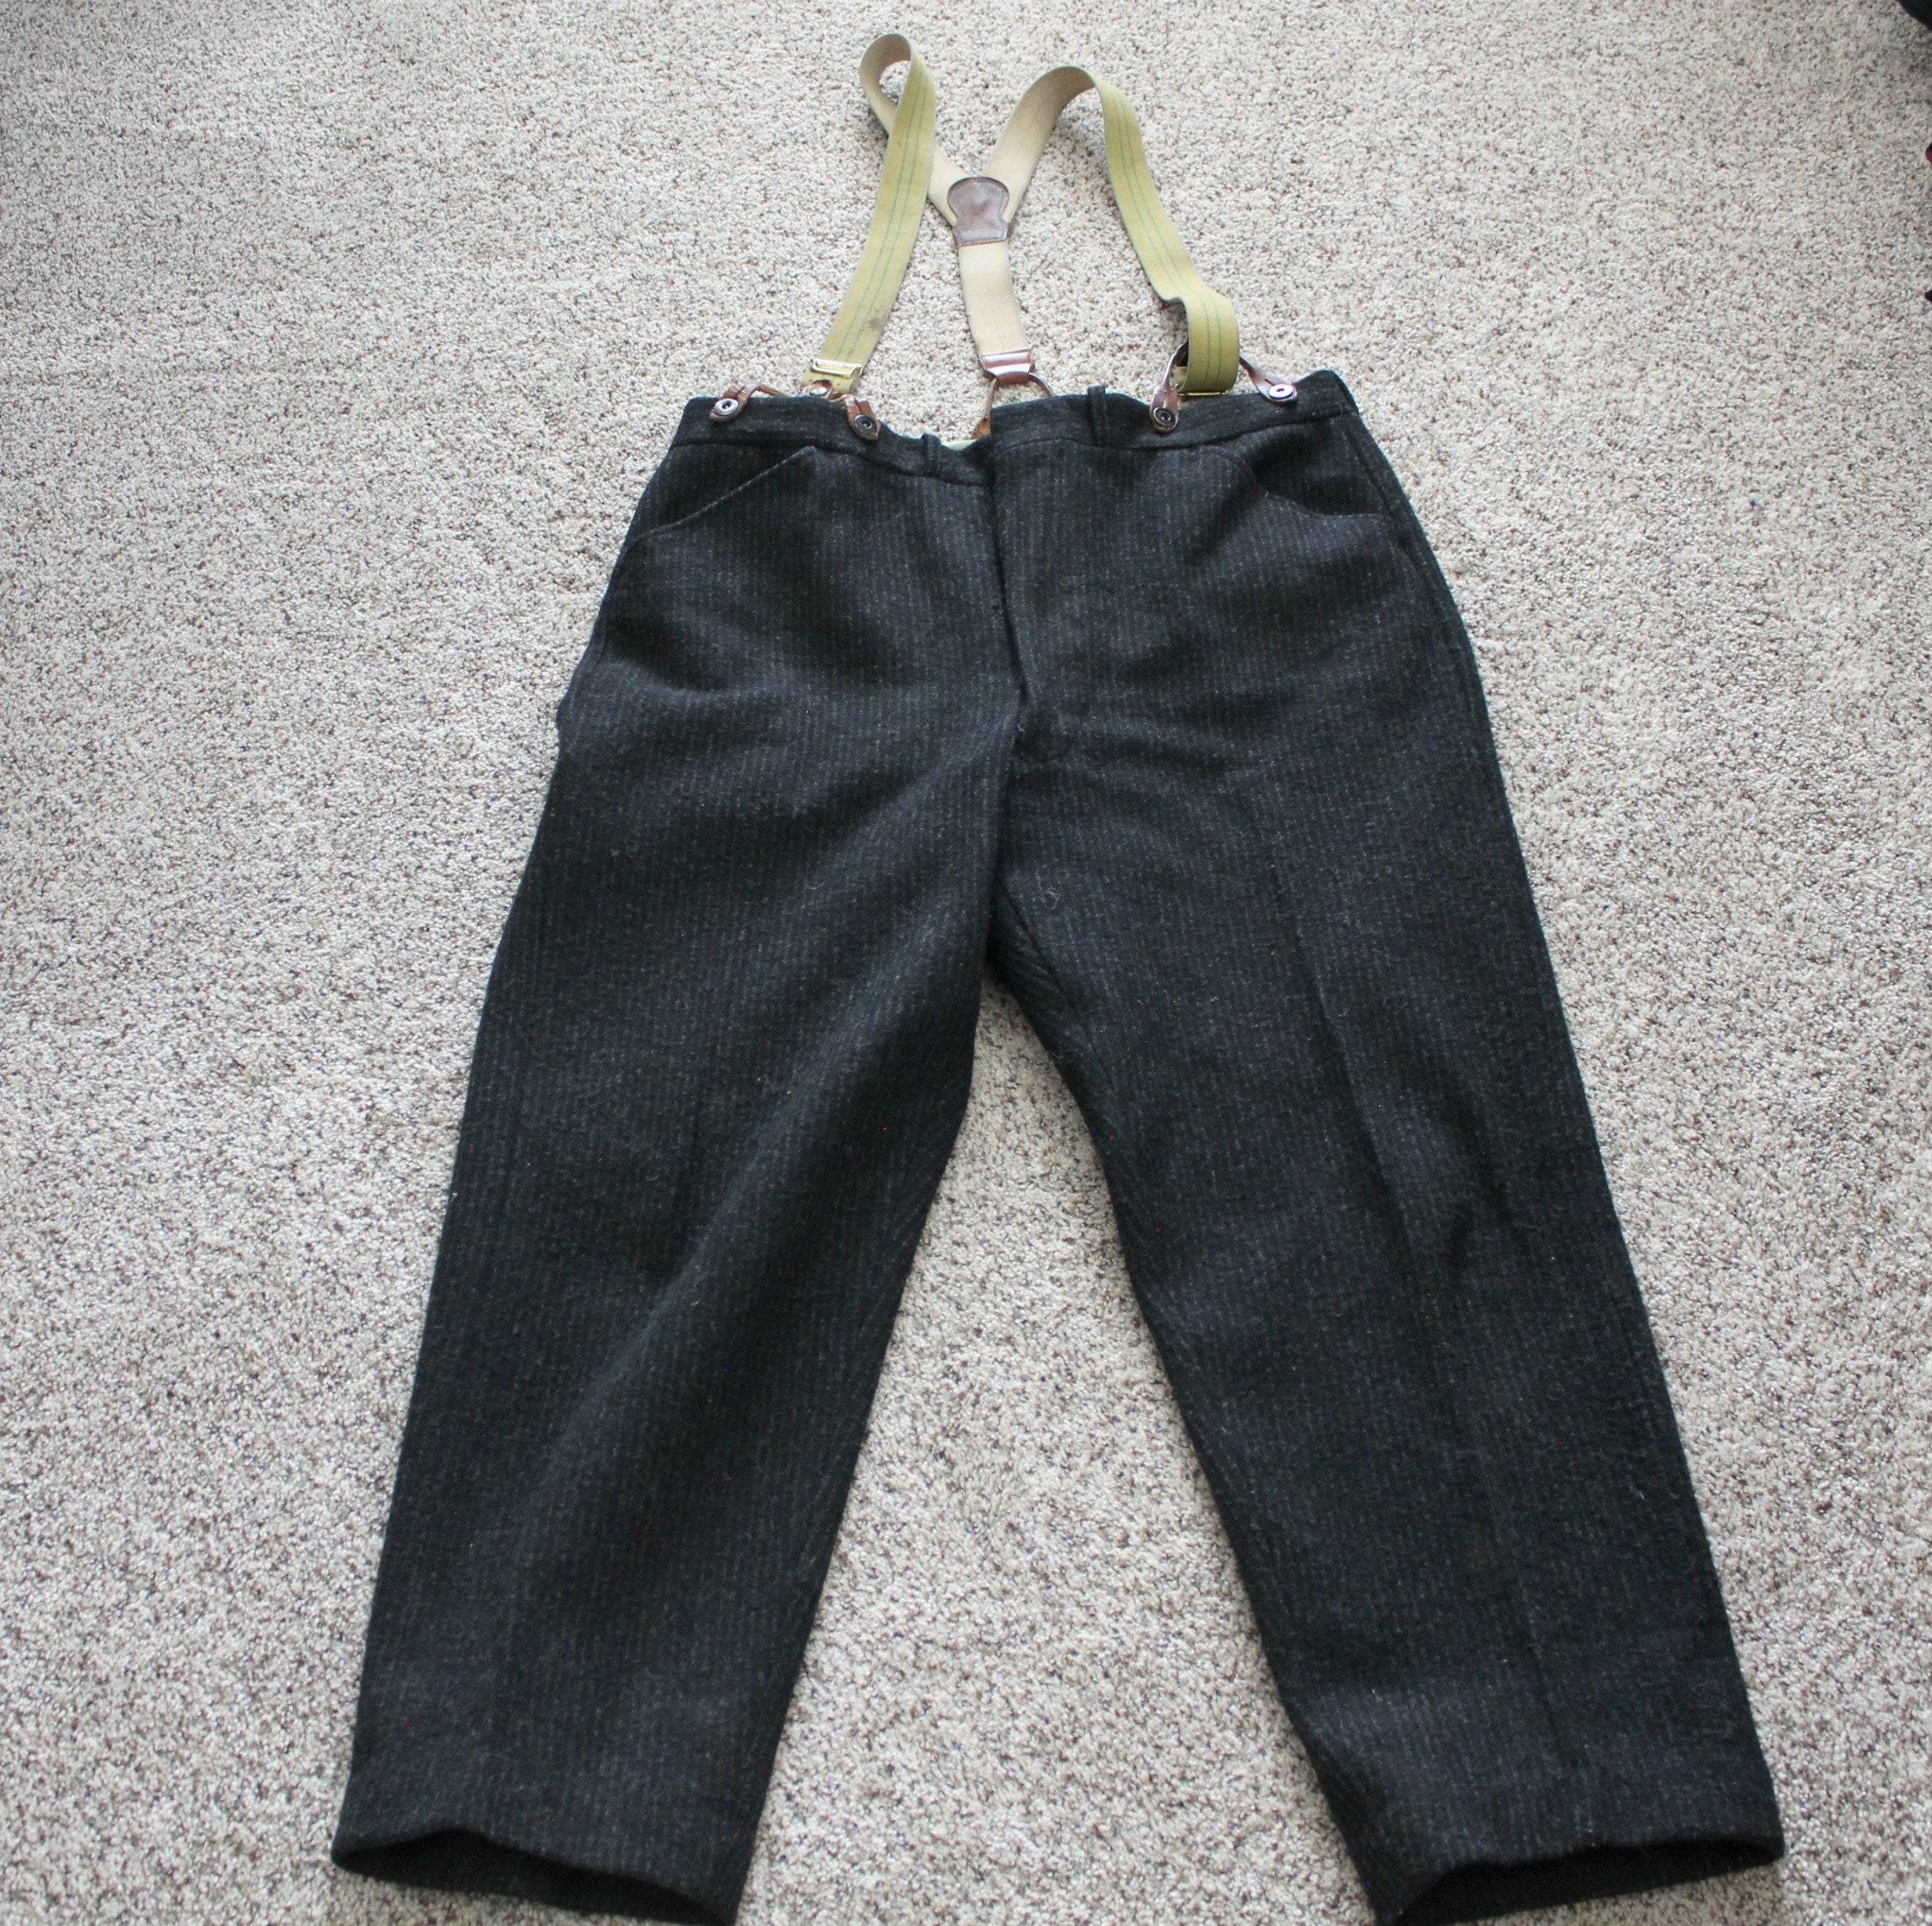 64f00c50b31e8 Vintage Woolrich Wool Striped Pants w/ Police Suspenders, 1960s Men's  Hunting